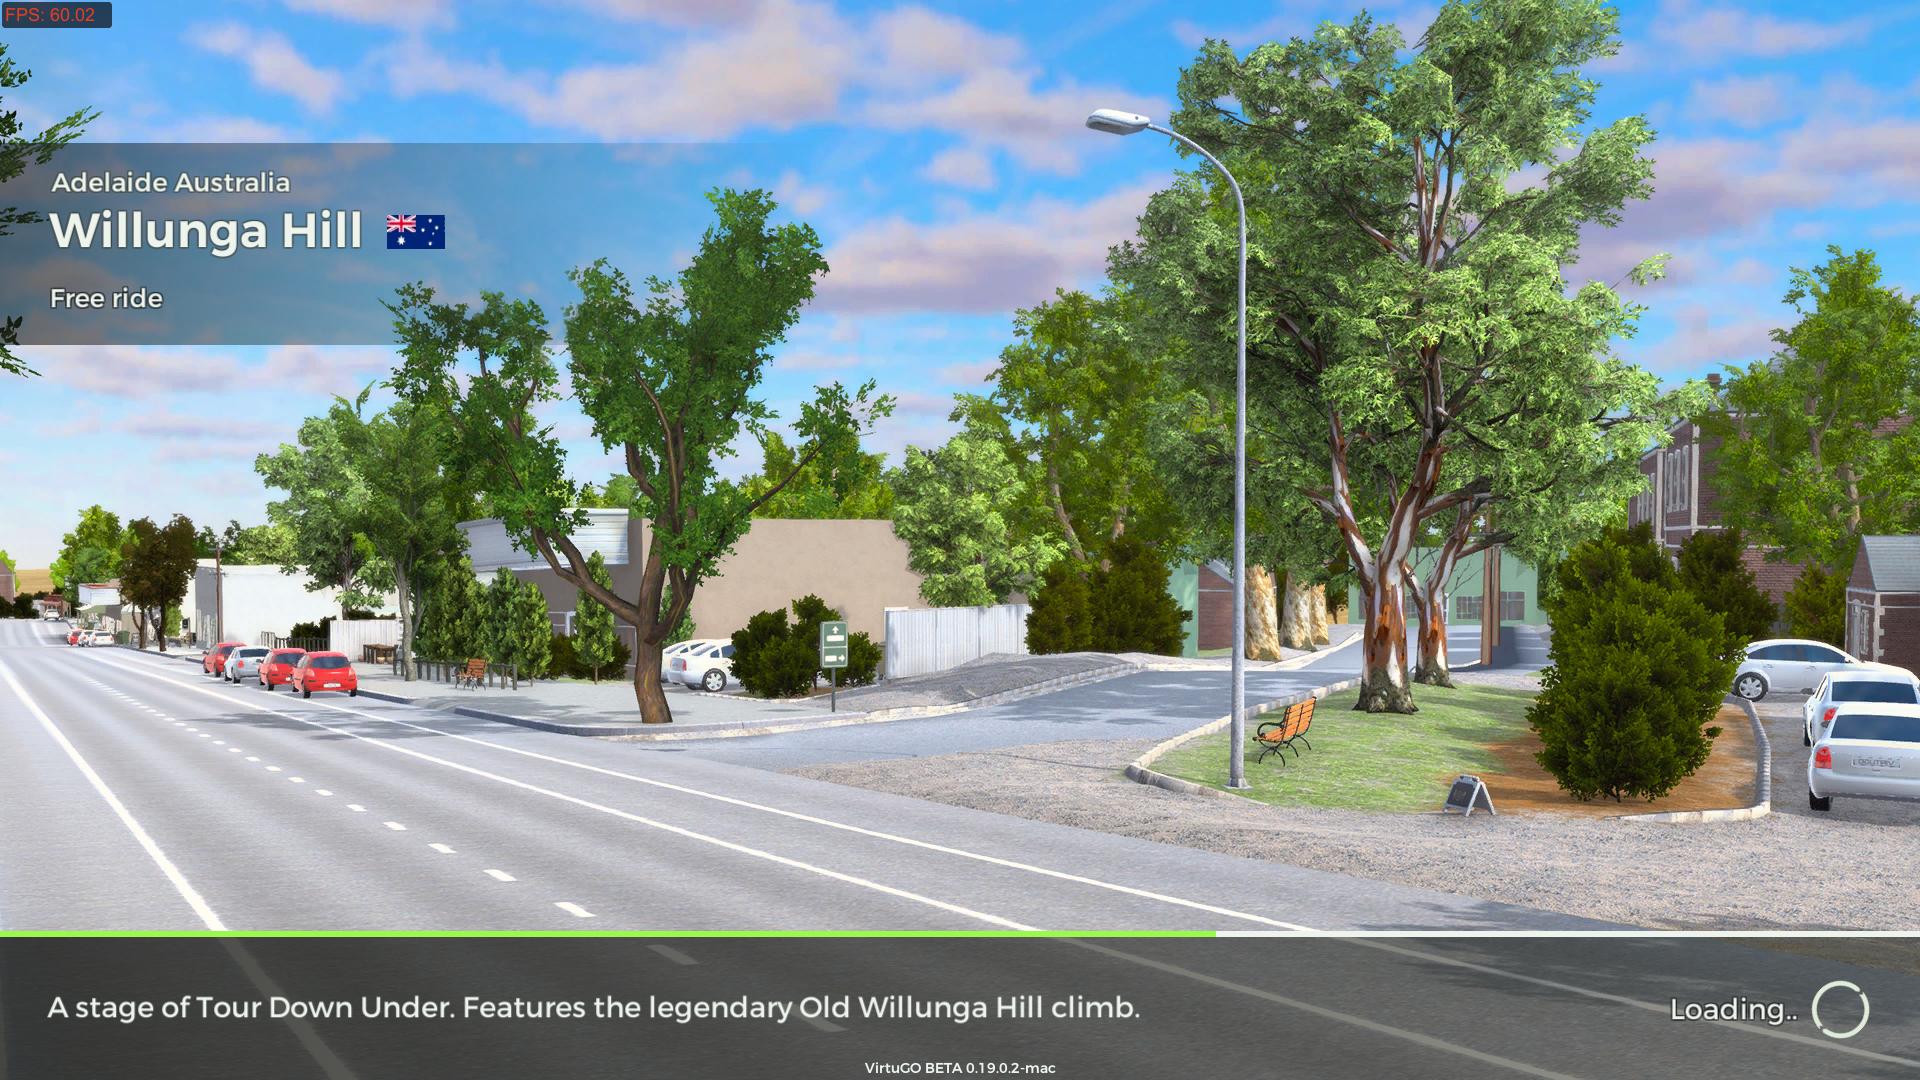 VirtuGO Free Ride on route Willunga Hill